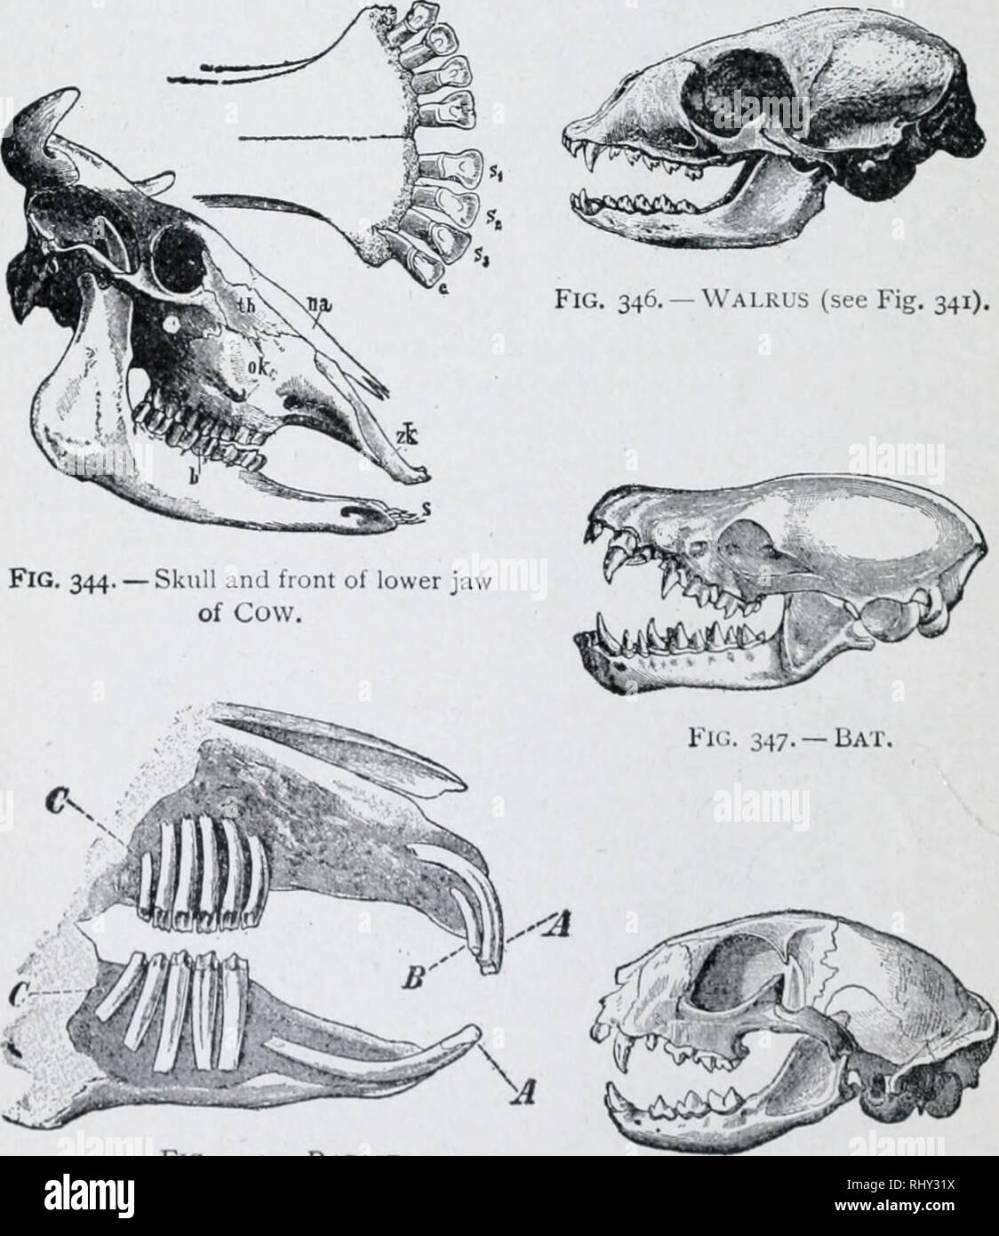 medium resolution of 1 94 chart of mammalian skulls illustrated study man s dental formula is 5 32 in like manner fill out formulas below cow 1 c 2 32 rabbit